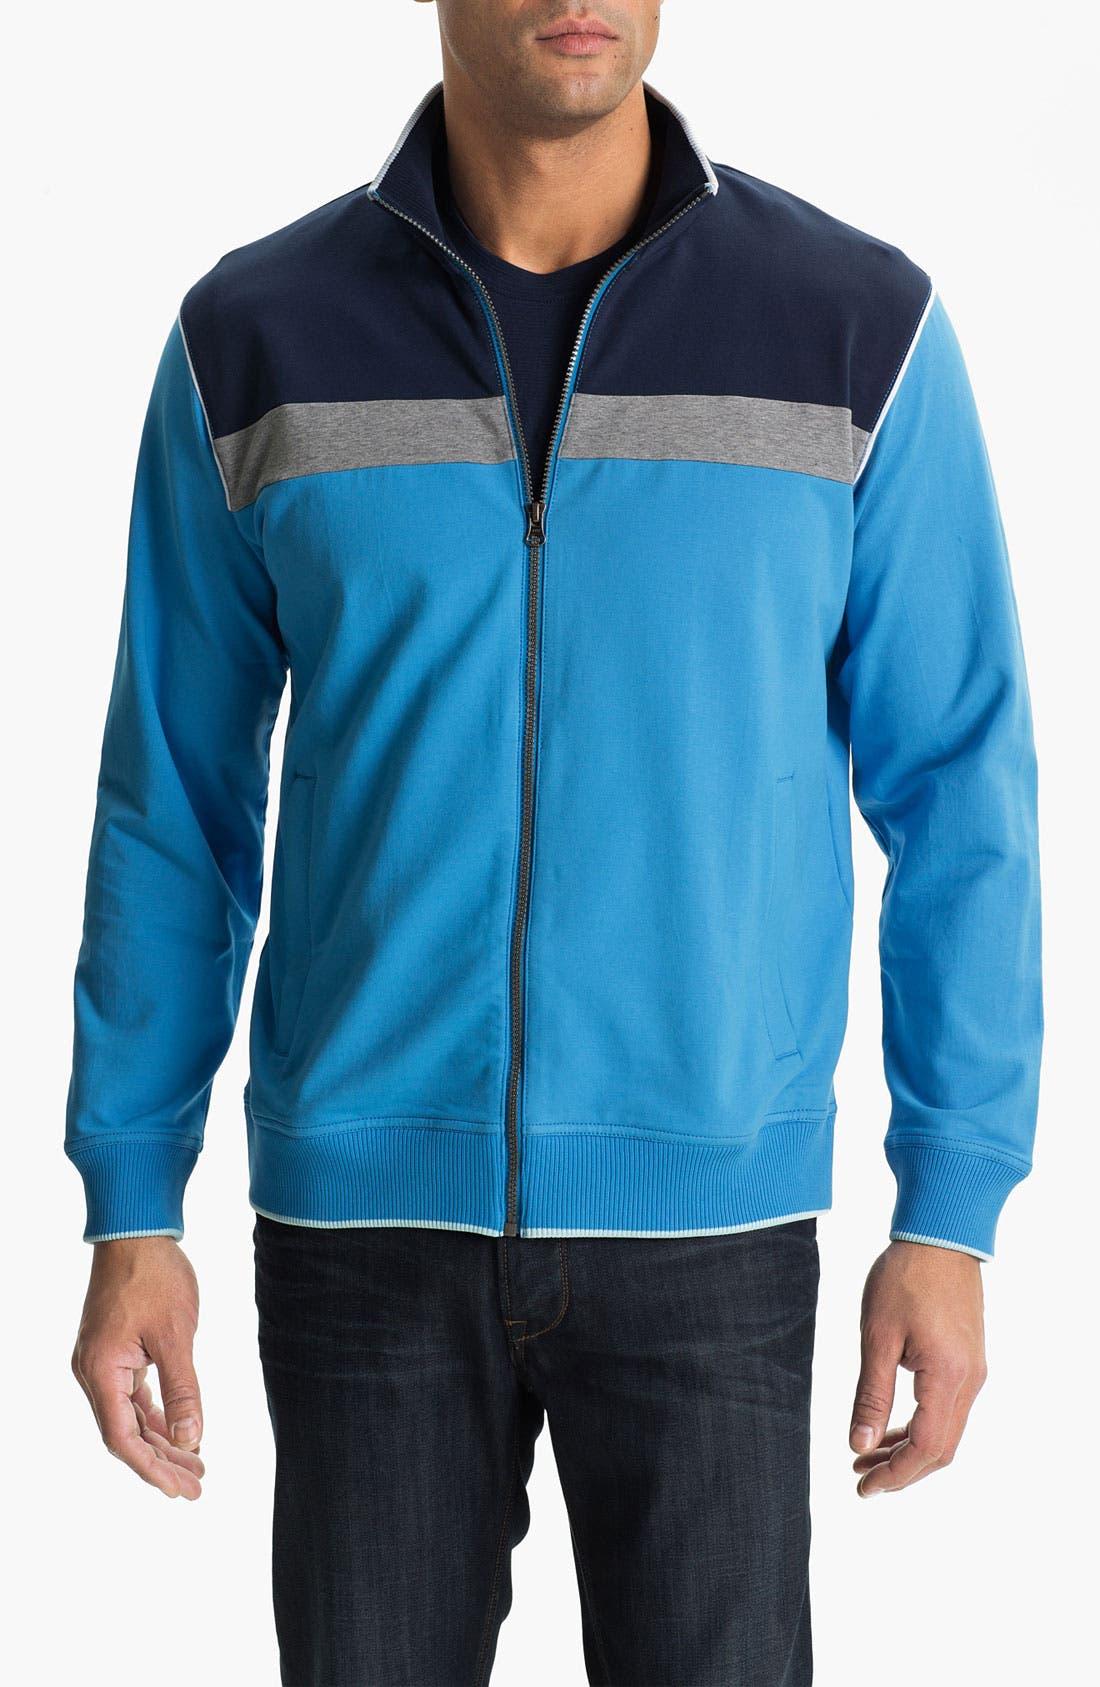 Alternate Image 1 Selected - Cutter & Buck 'Broadmoor' Full Zip Jacket